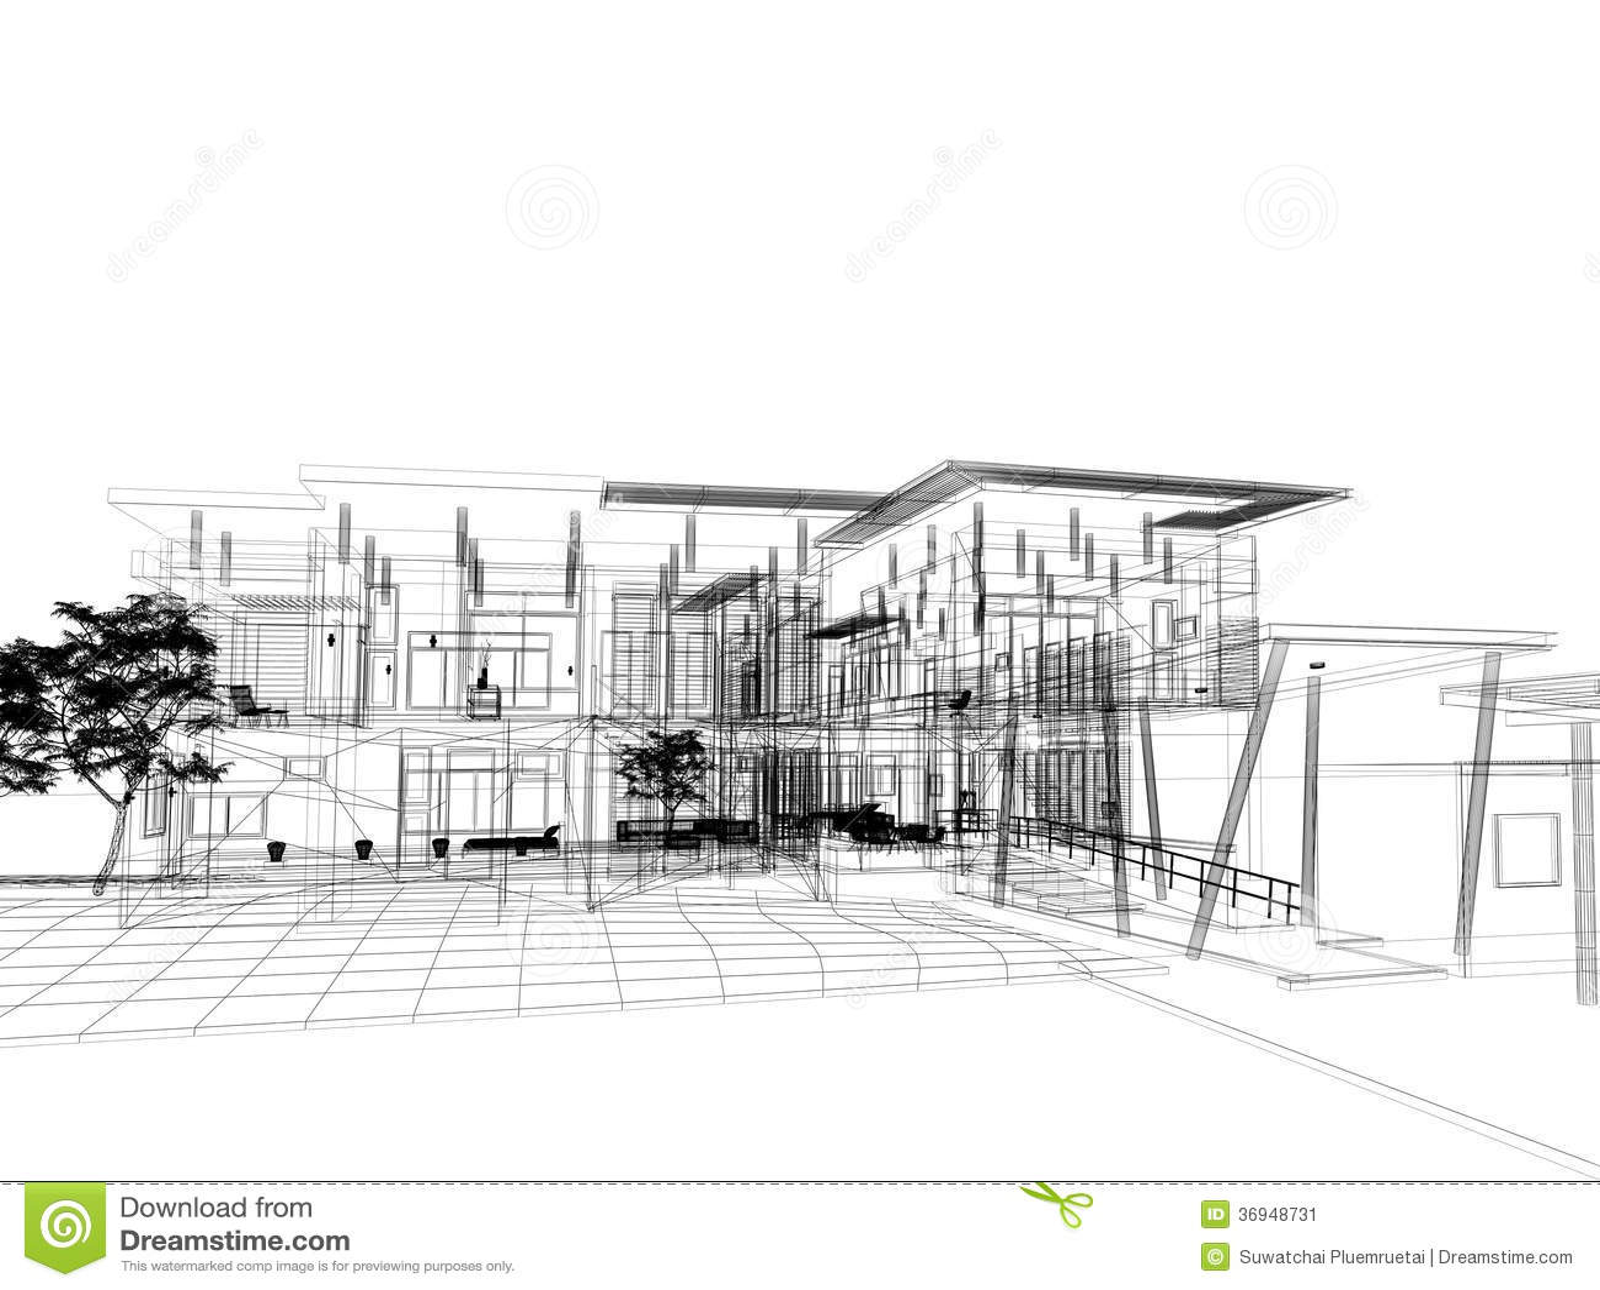 Sketch design of house stock illustration. Image of